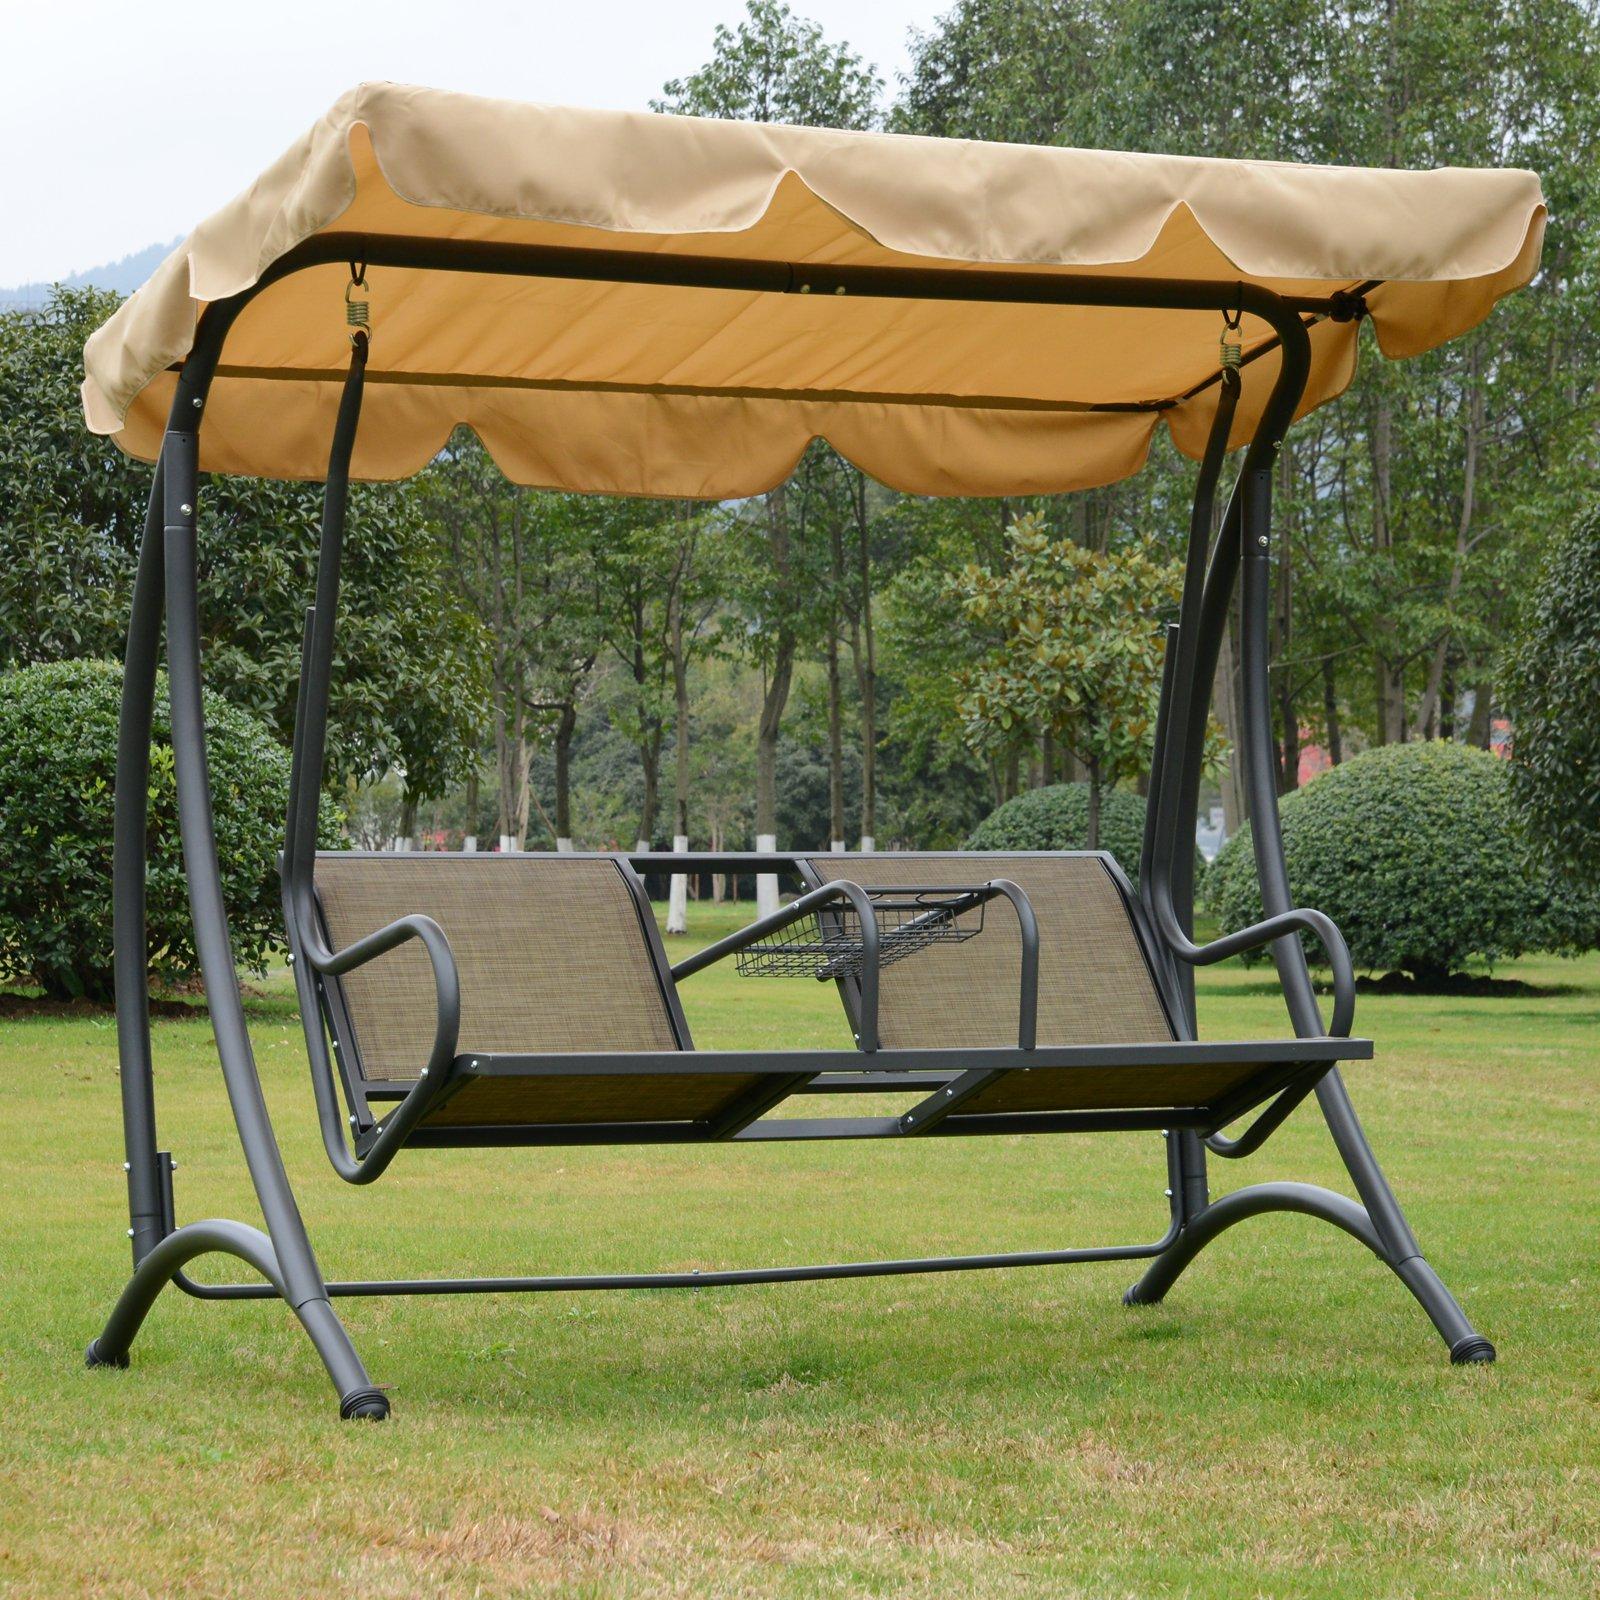 Full Size of Outsunny 2 Sitzer Hollywoodschaukel Schaukel Mit Sonnendach Regal Metall Bett Regale Weiß Wohnzimmer Gartenschaukel Metall